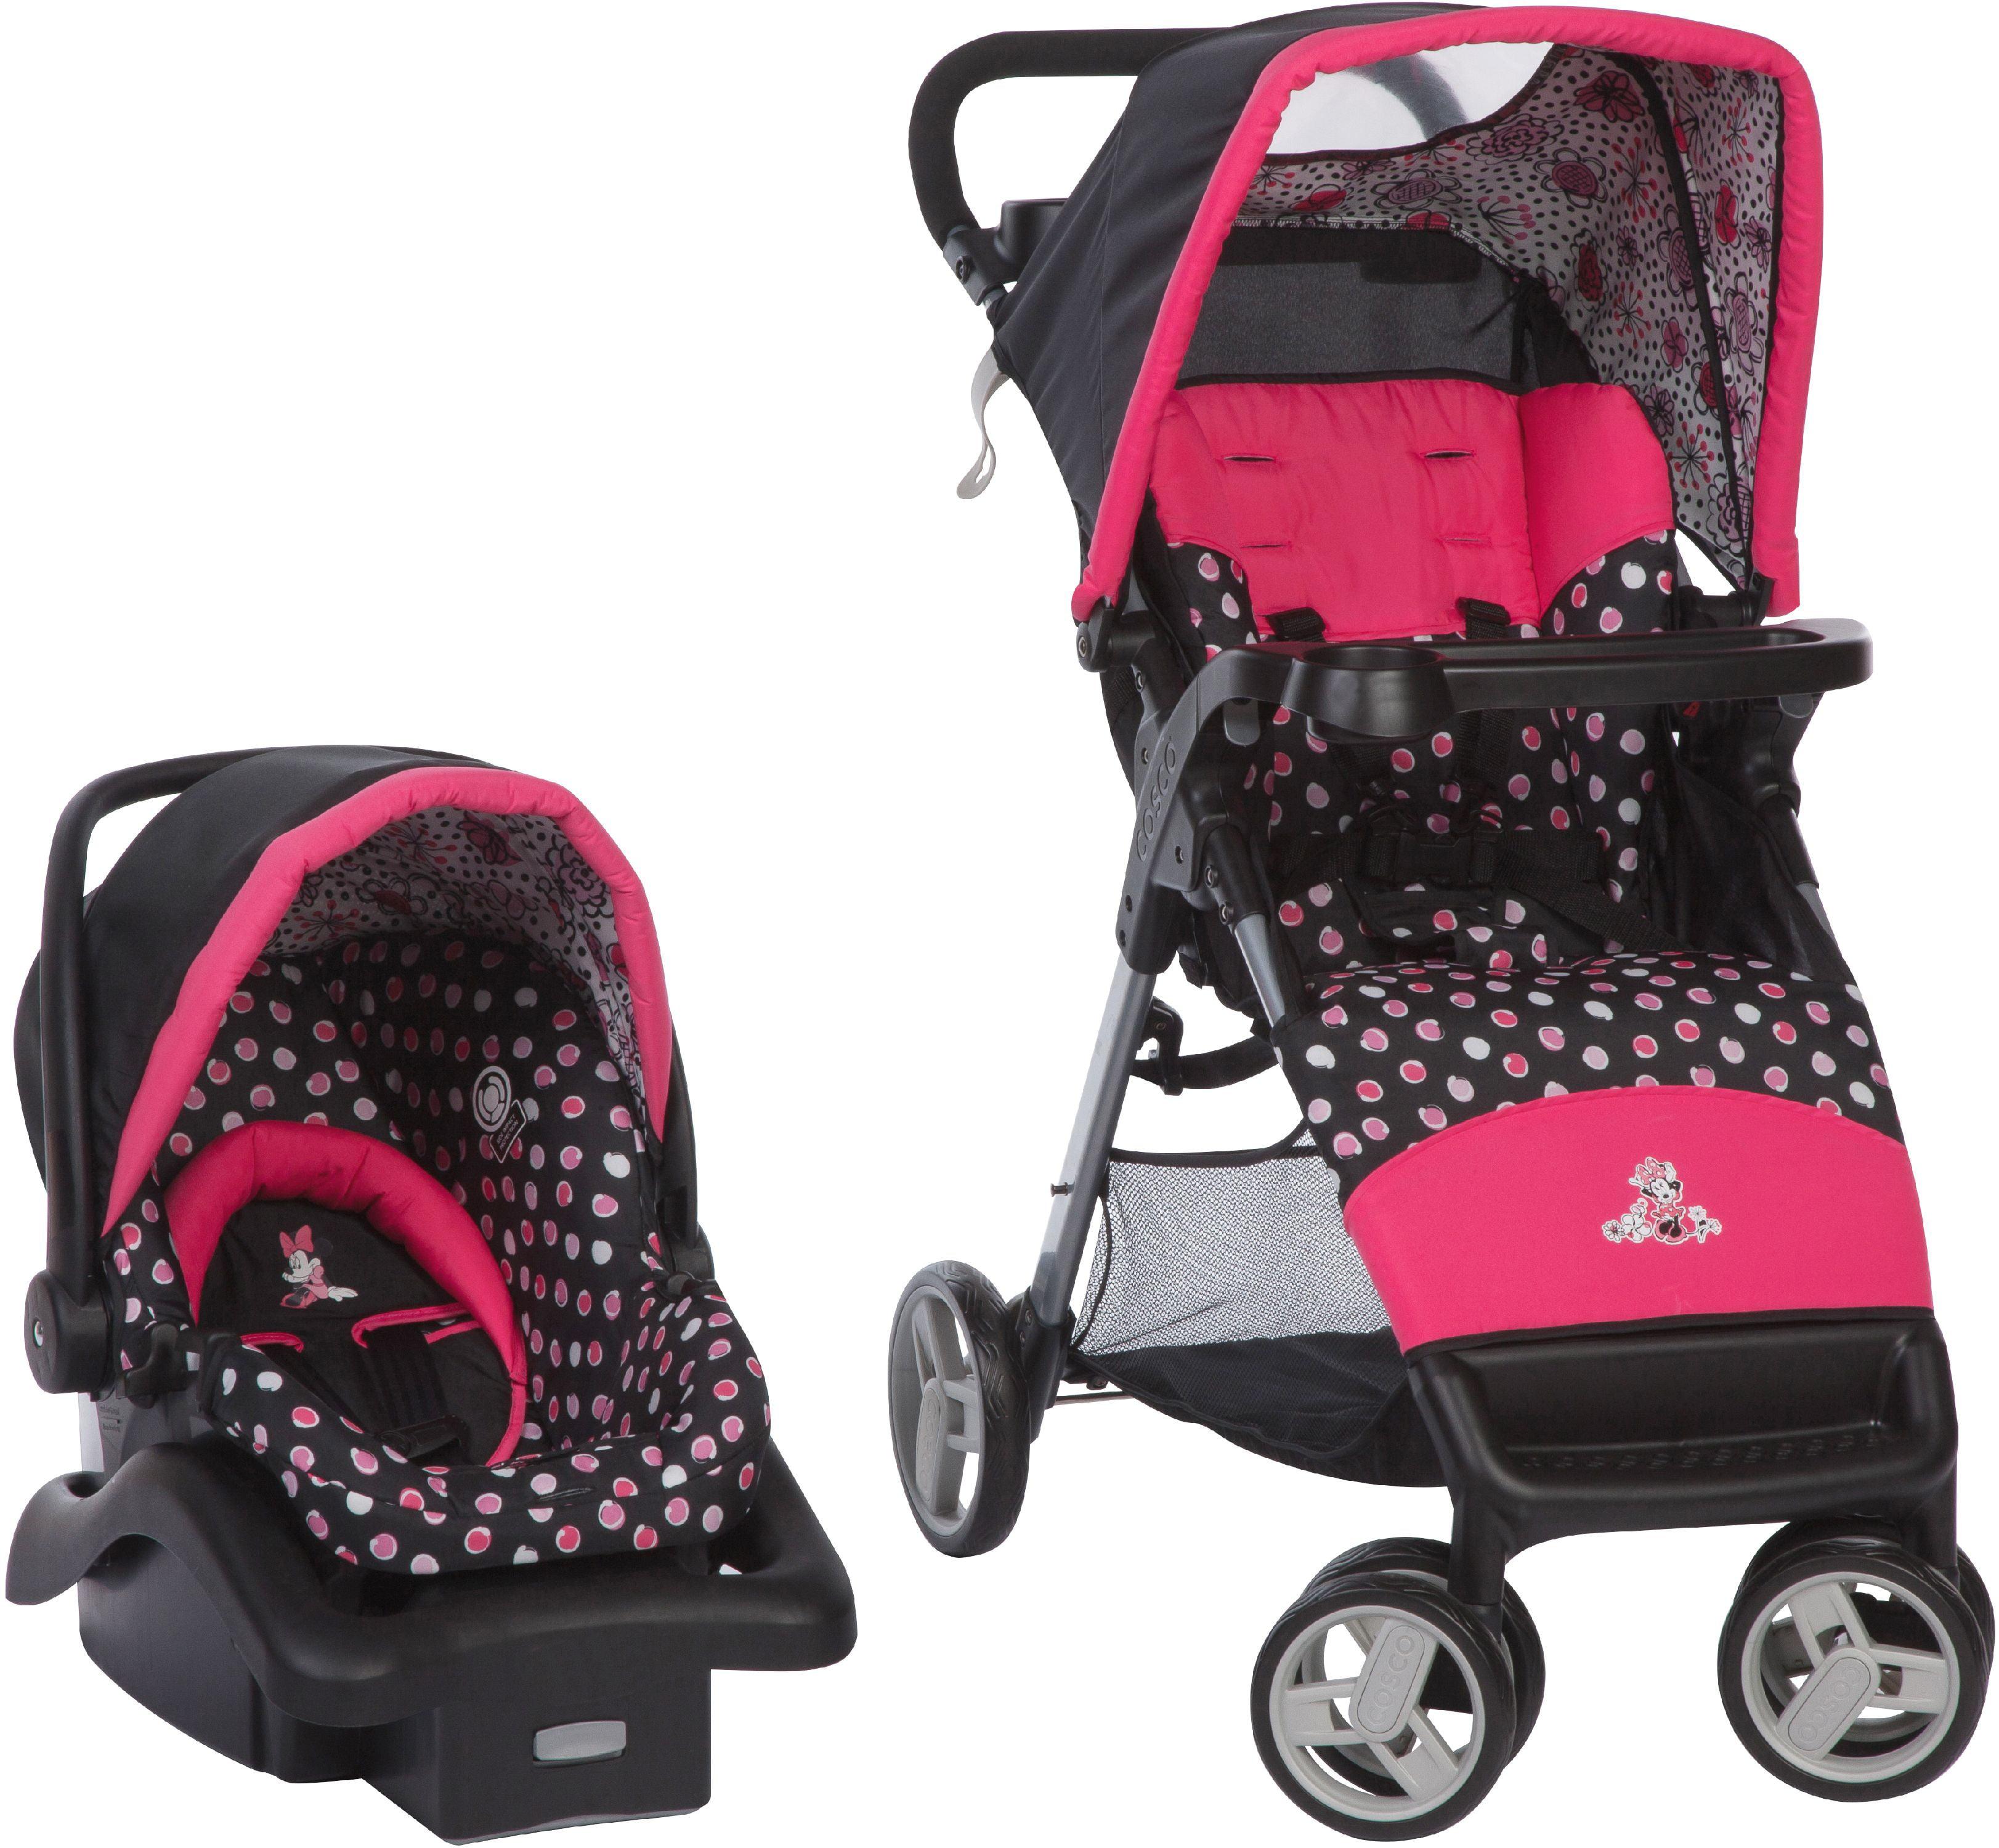 Disney Baby Simple Fold LX Travel System, Minnie Mash Up